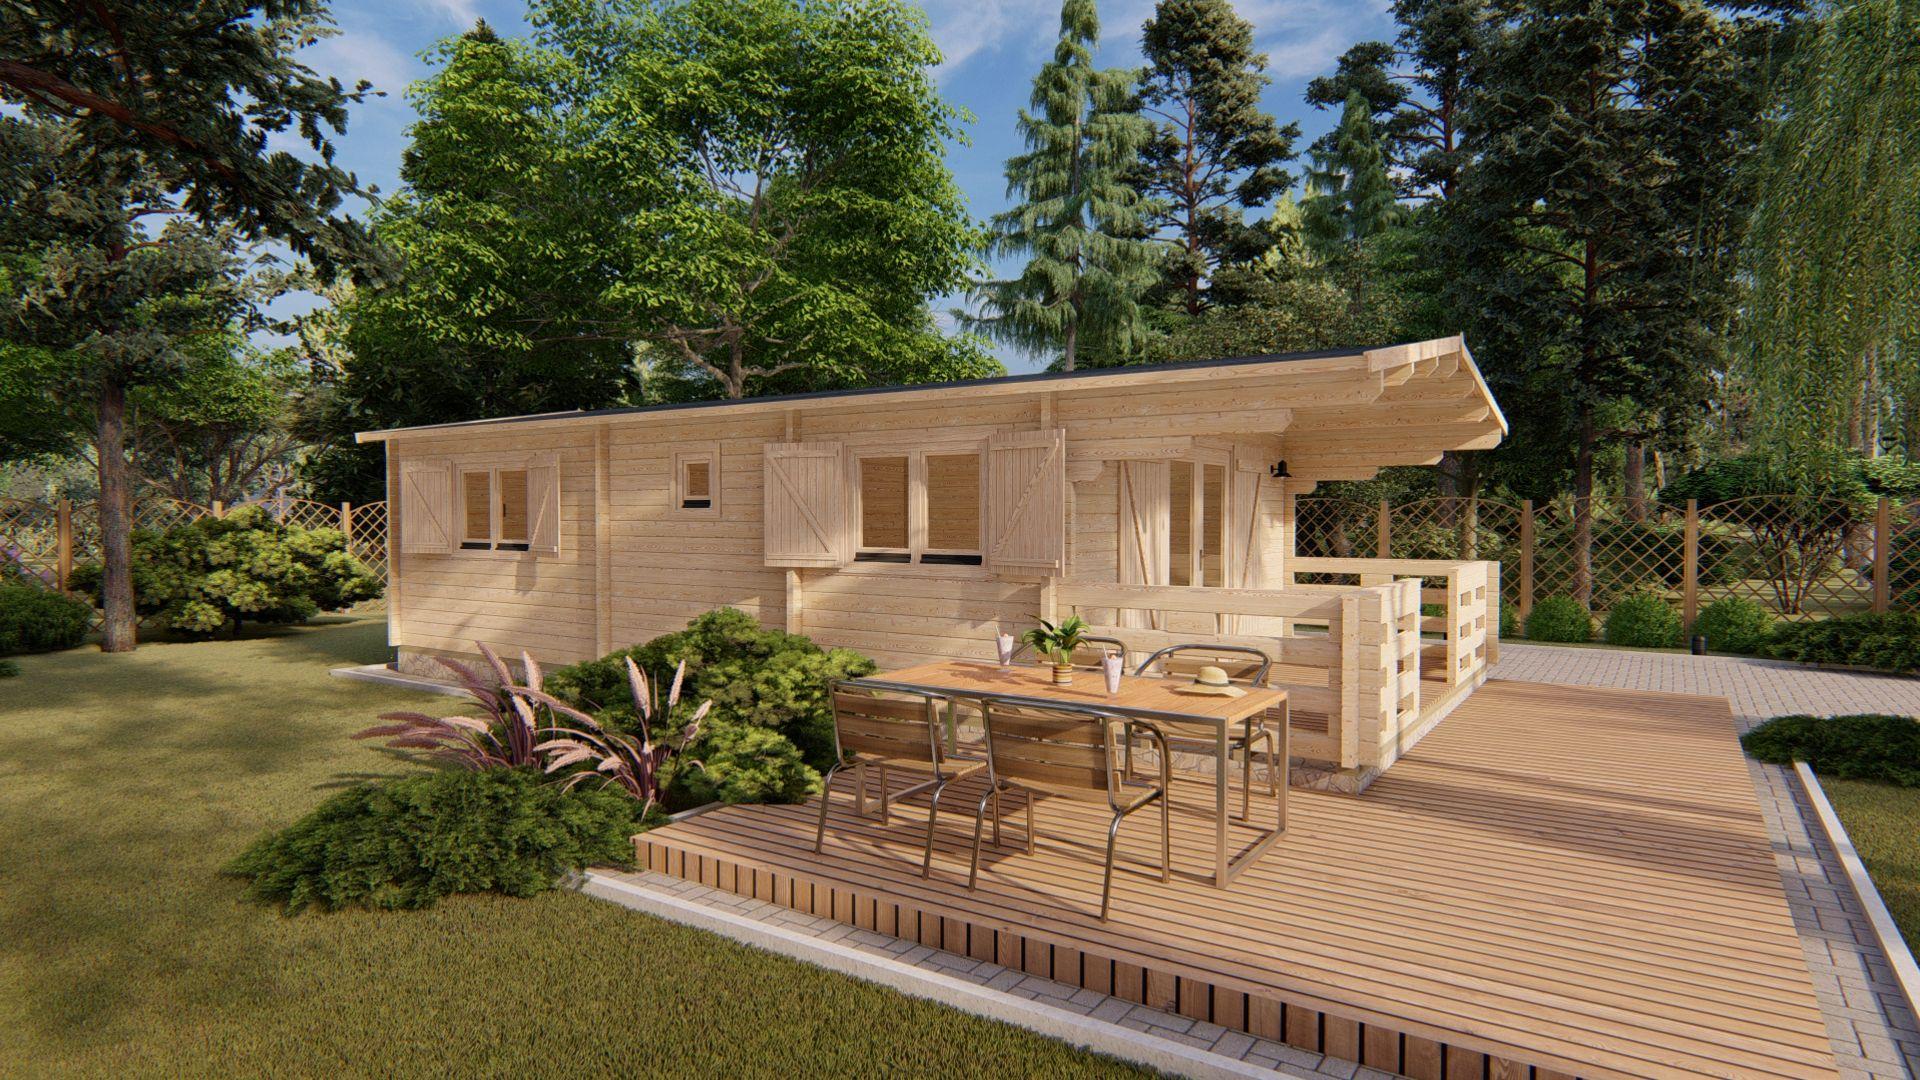 Bungalow in prefabricated wood model Typ-2 | Gardendeco